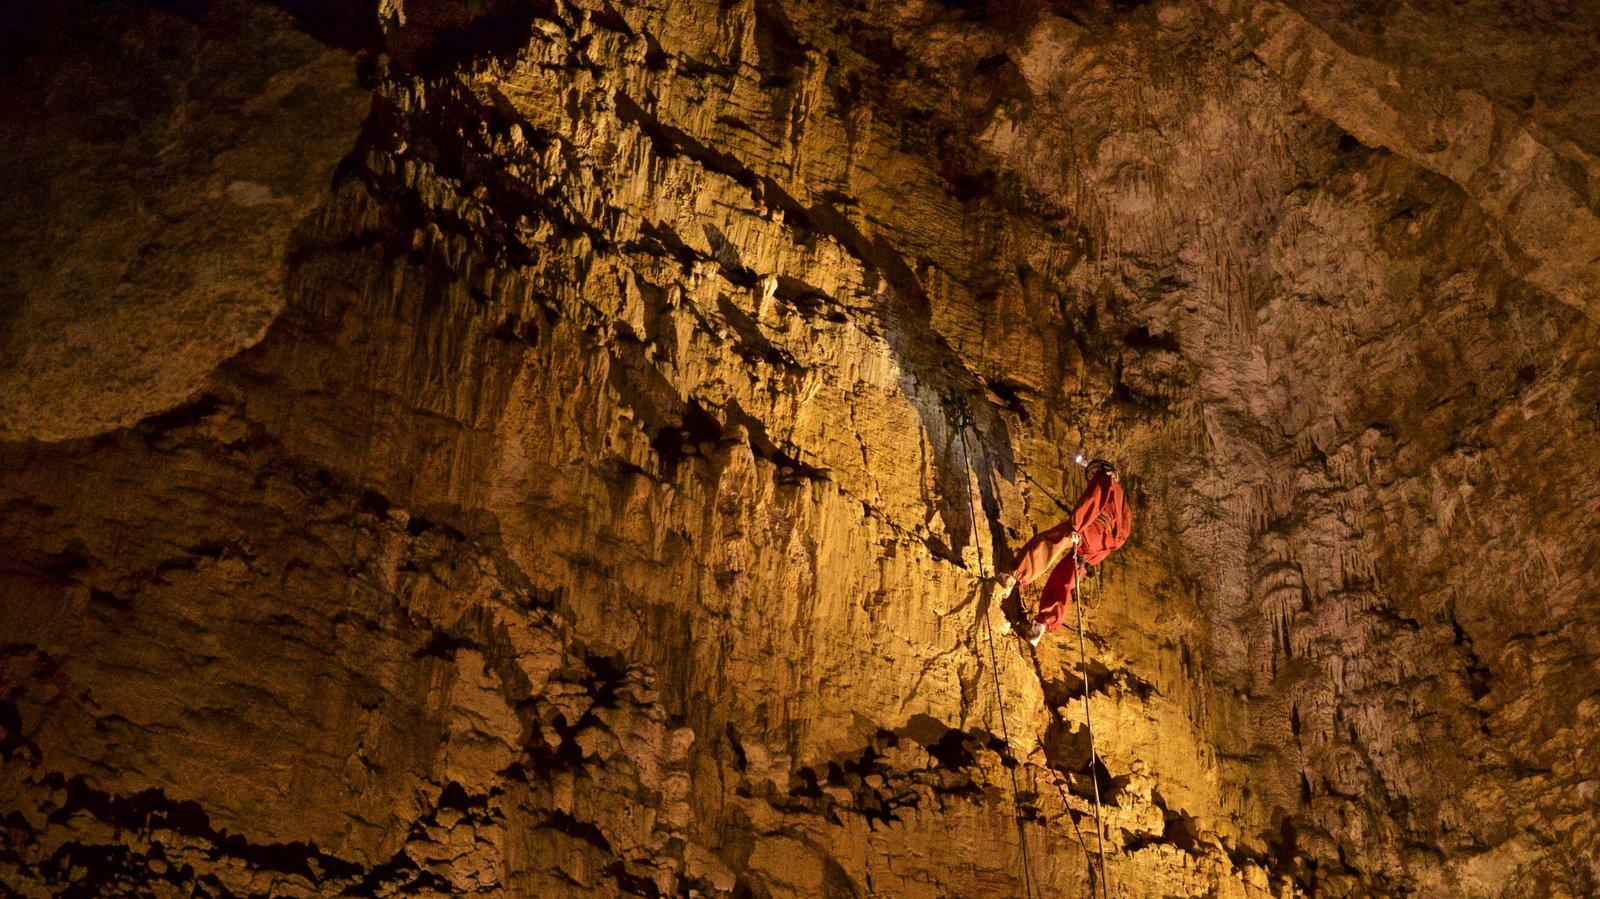 Waitomo Caves featuring caves and caving